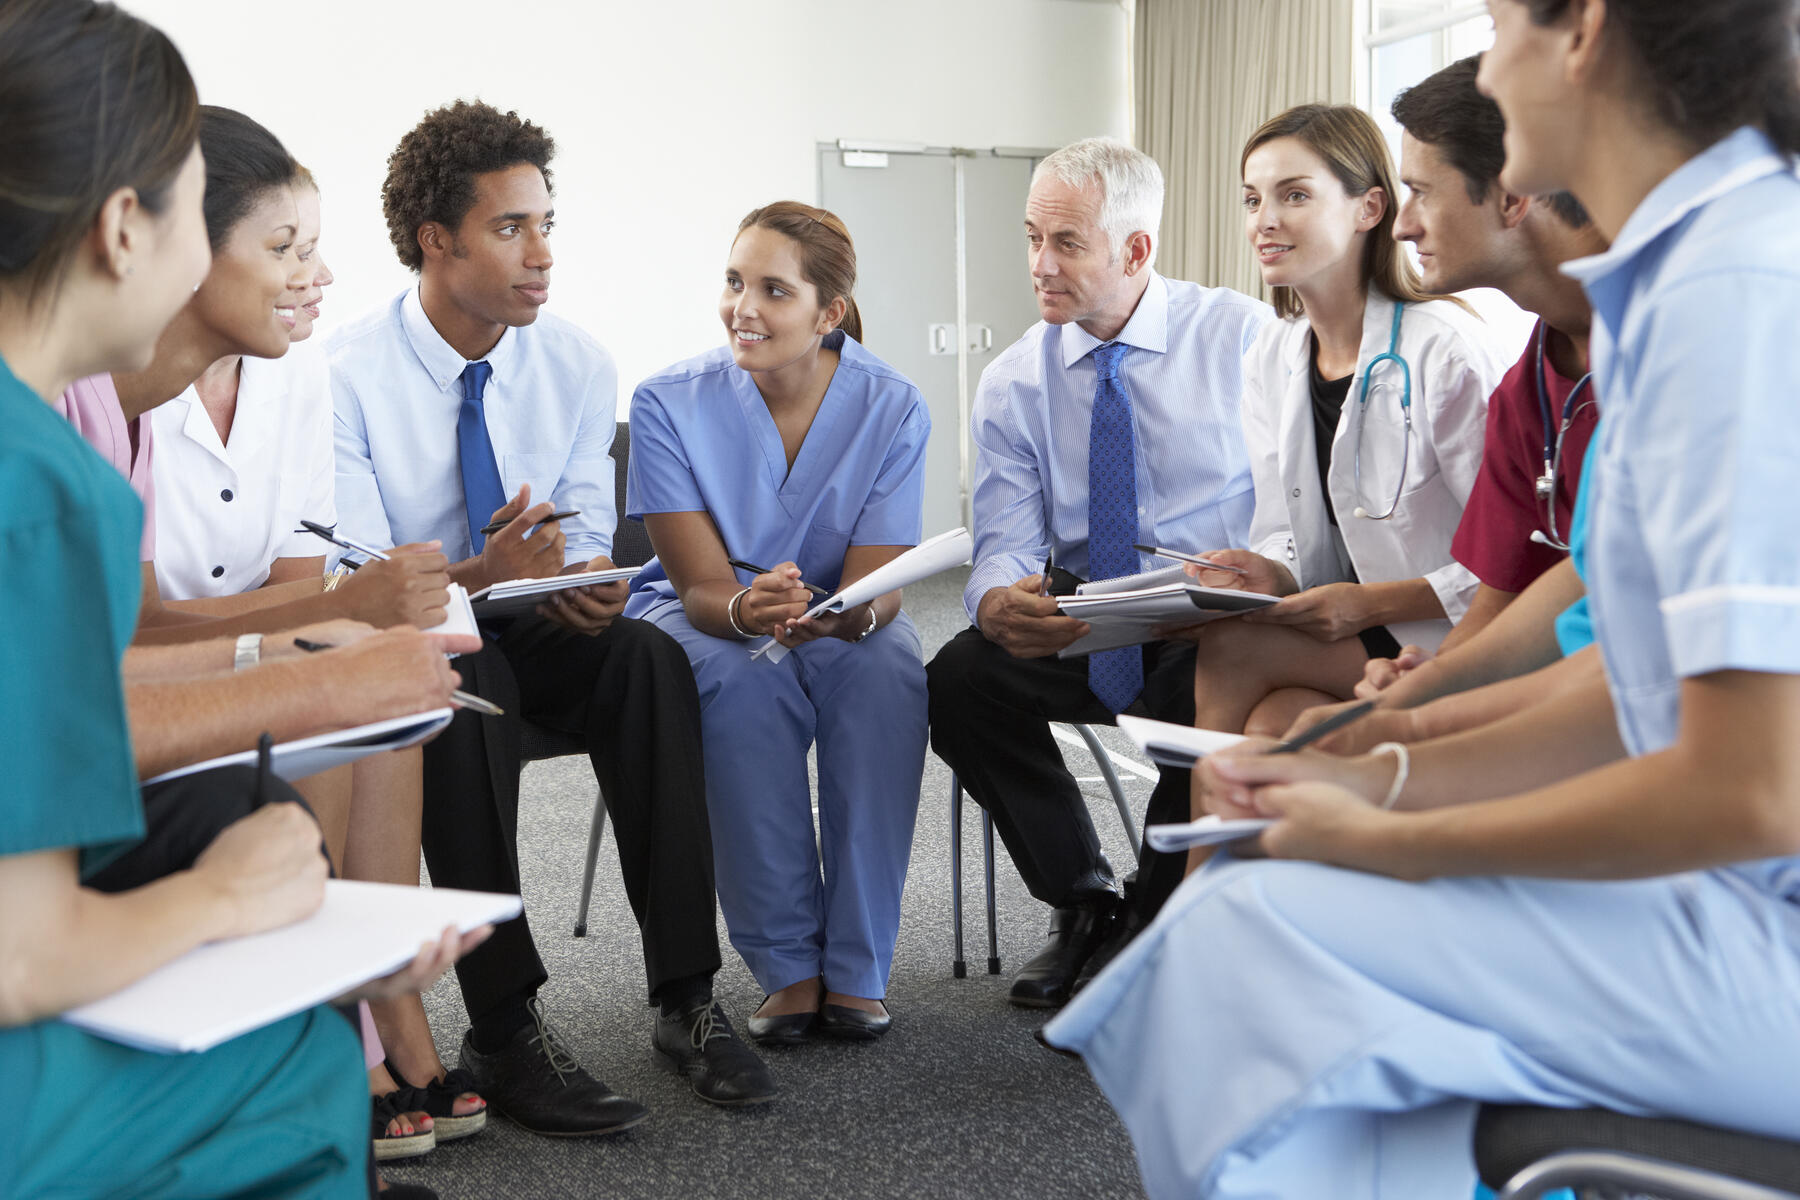 Team of hospital employees